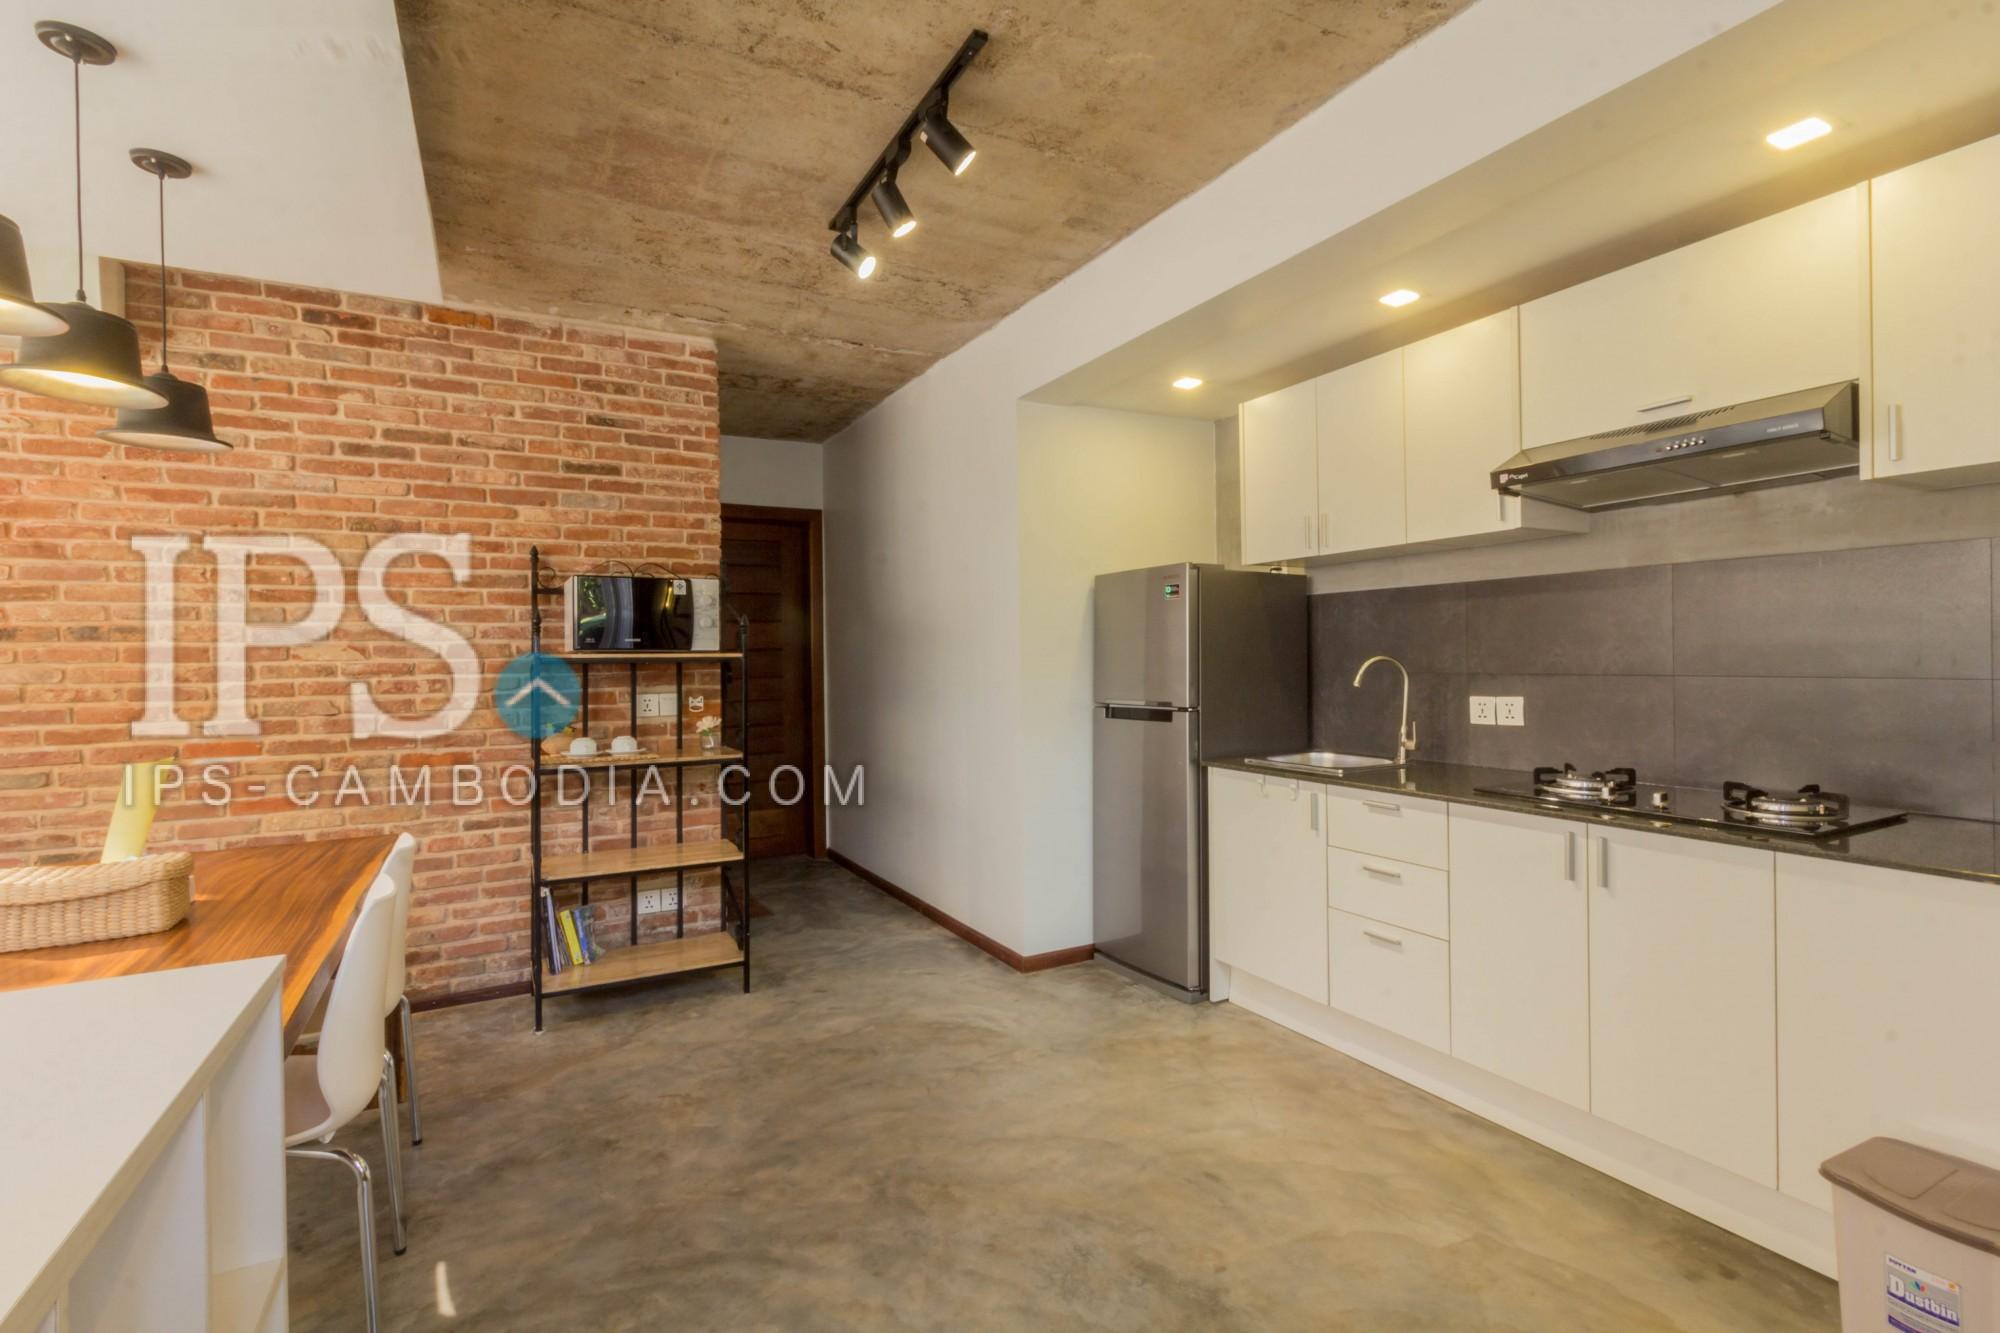 Western Style 1 Bedroom Apartment For Rent - Svay Dangkum, Siem Reap